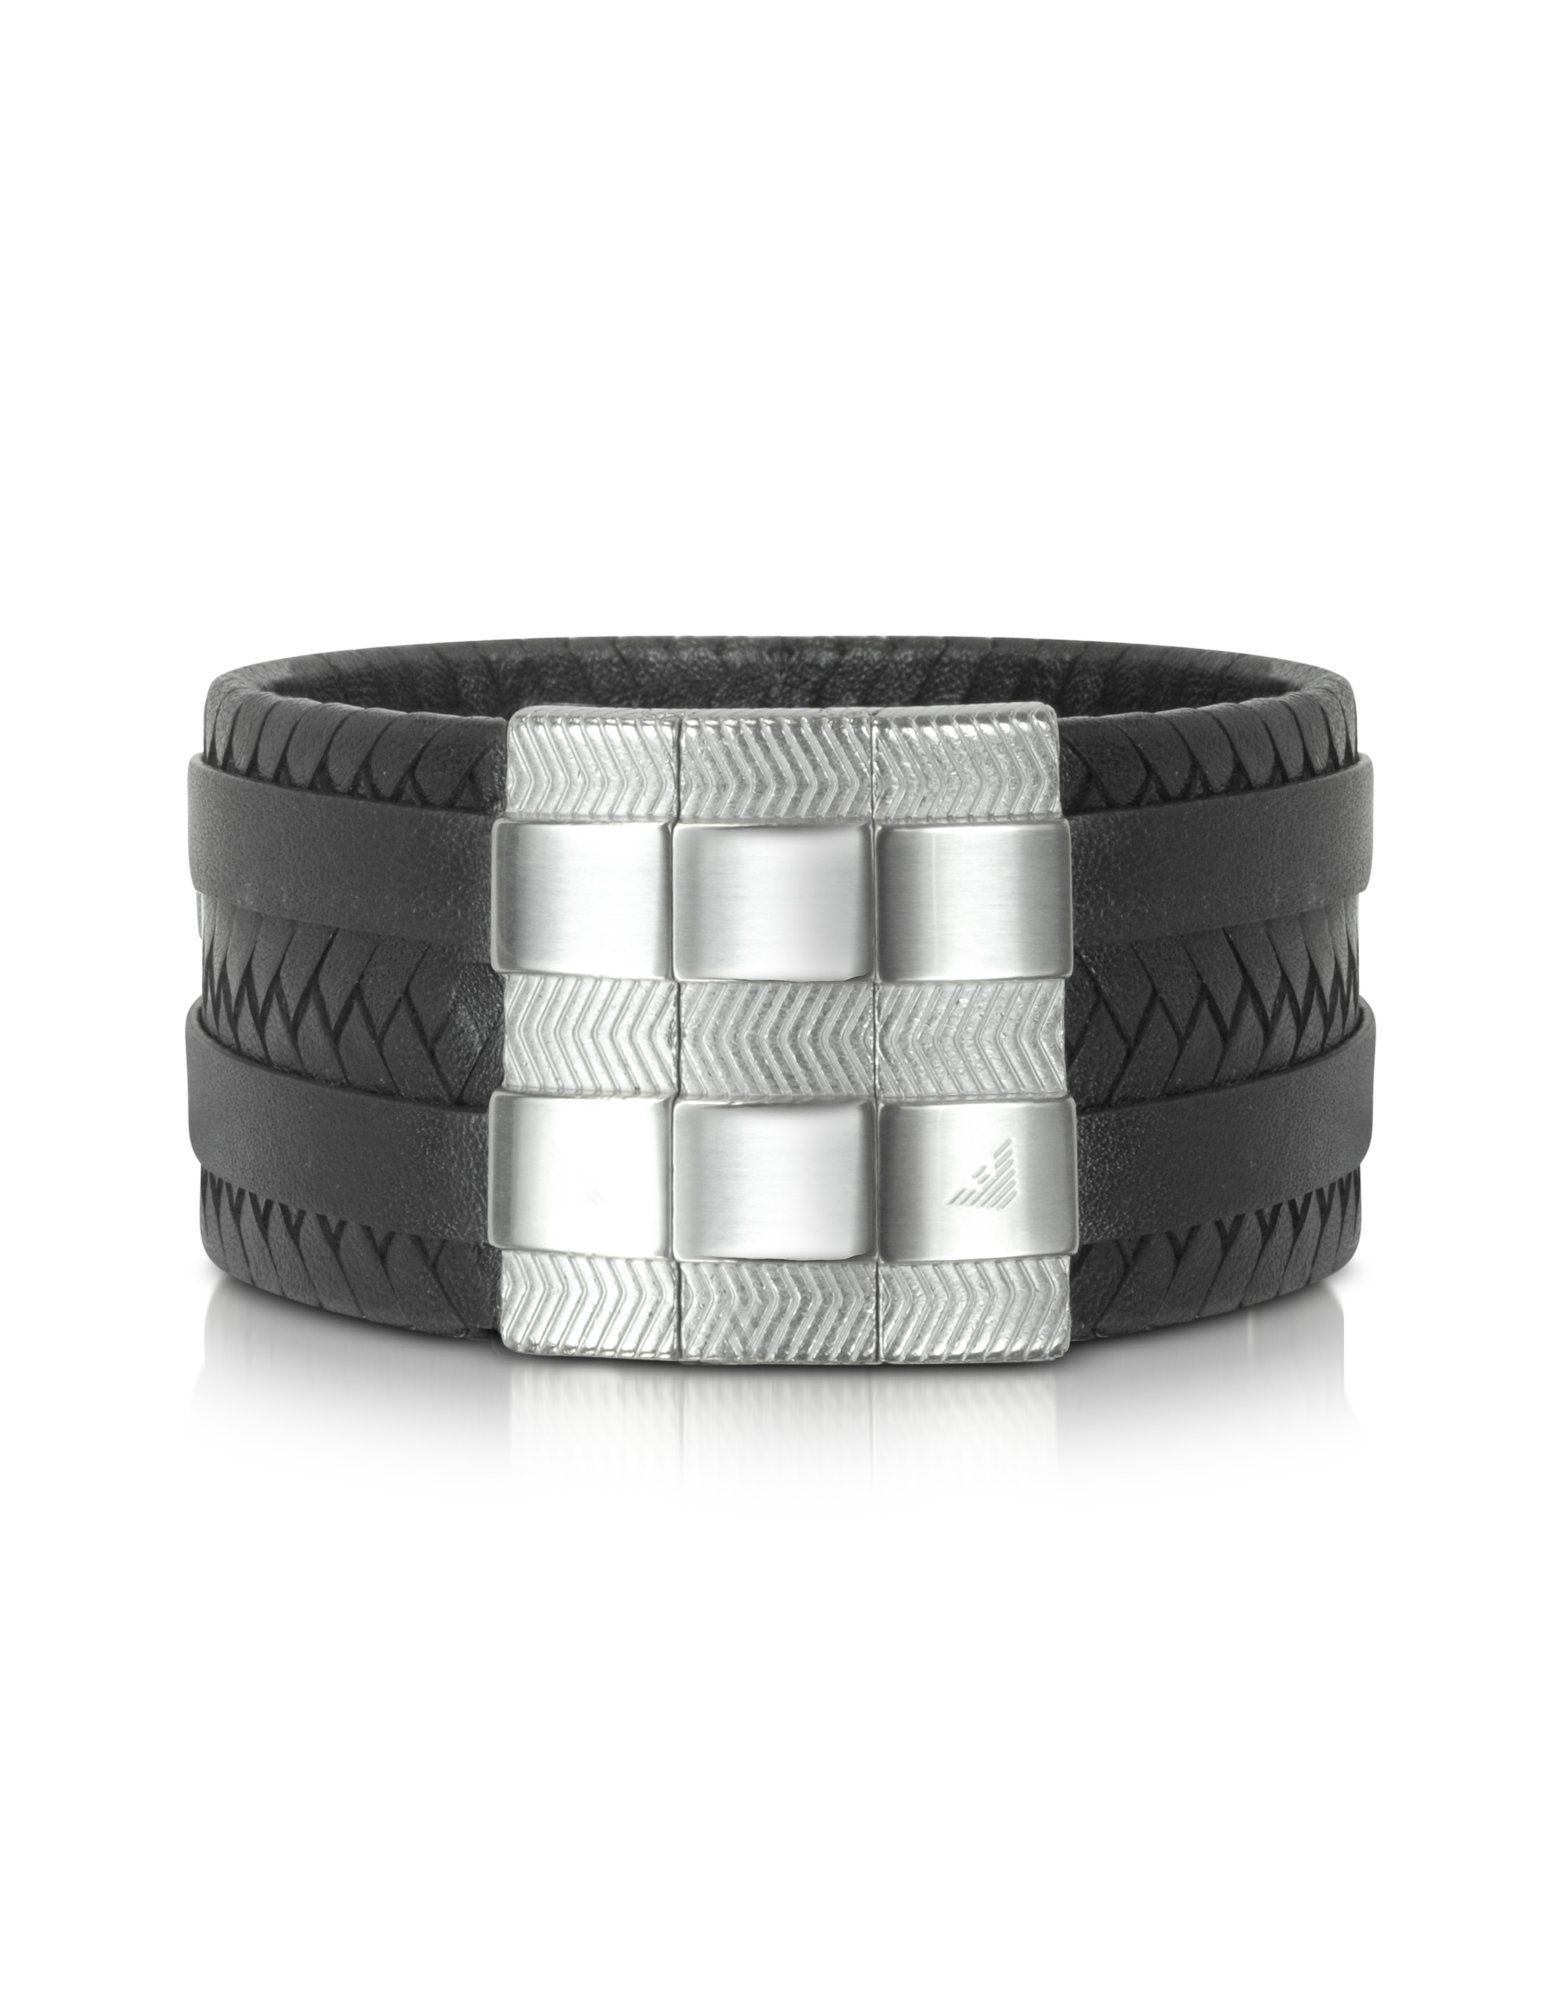 7b7a9f4a1 Men's Metallic Wide Braided Leather Bracelet   black - man`s fashion ...